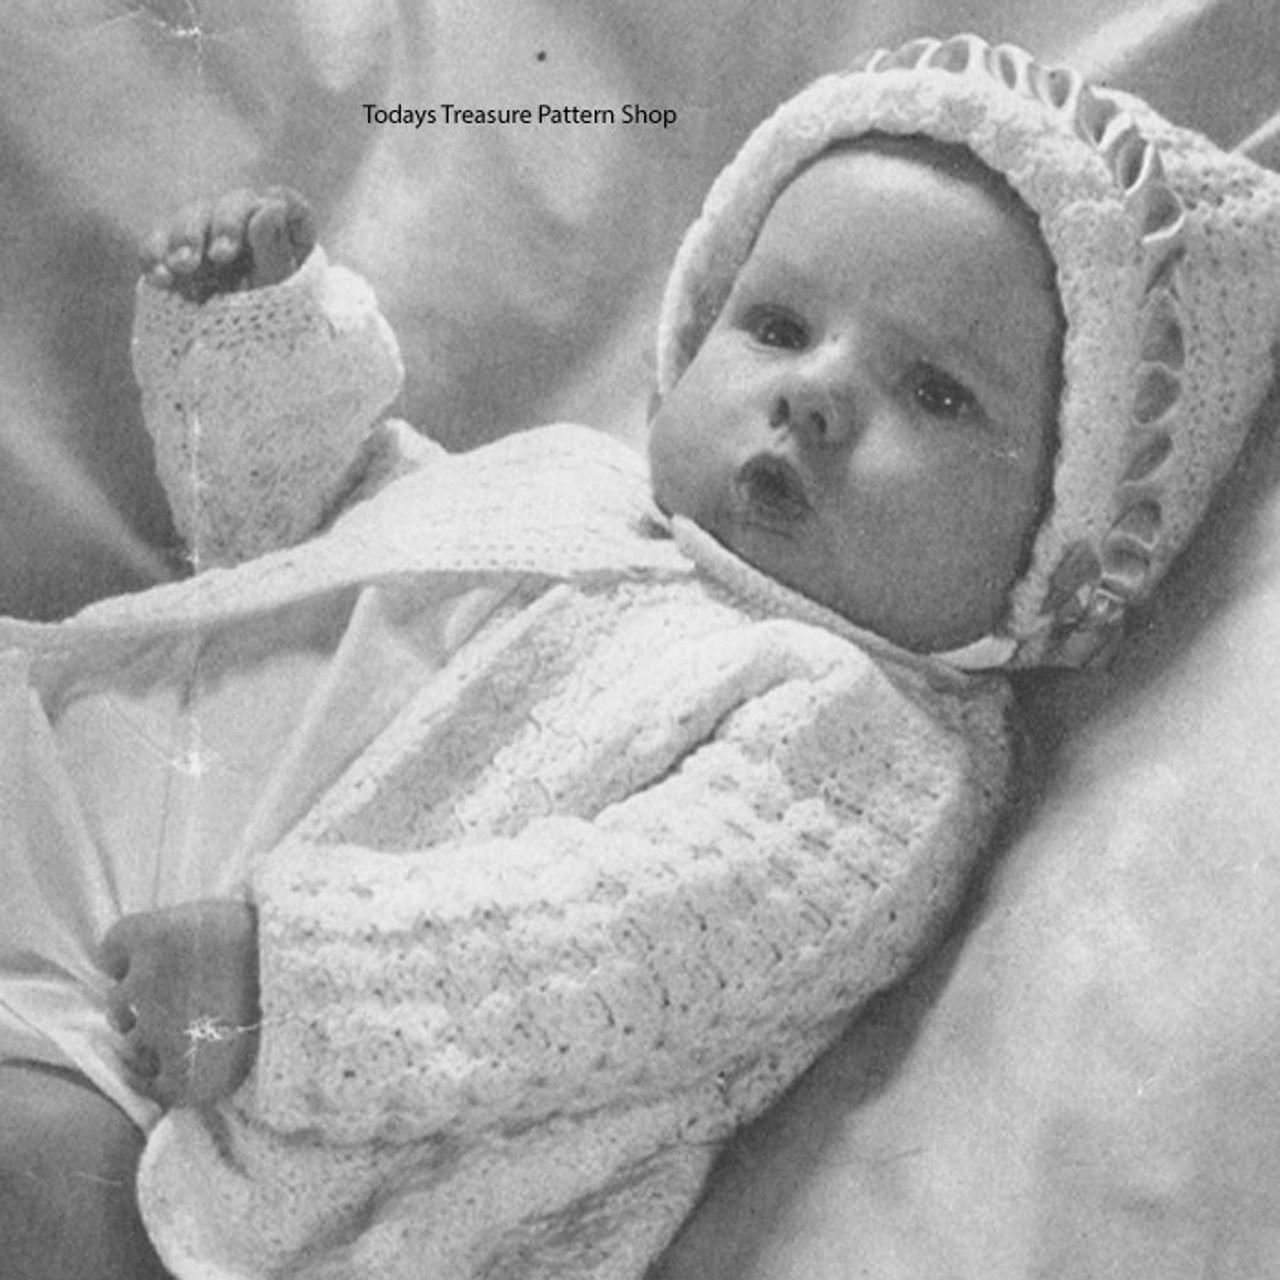 Crochet Baby Jacket Pattern in Shell Stitch